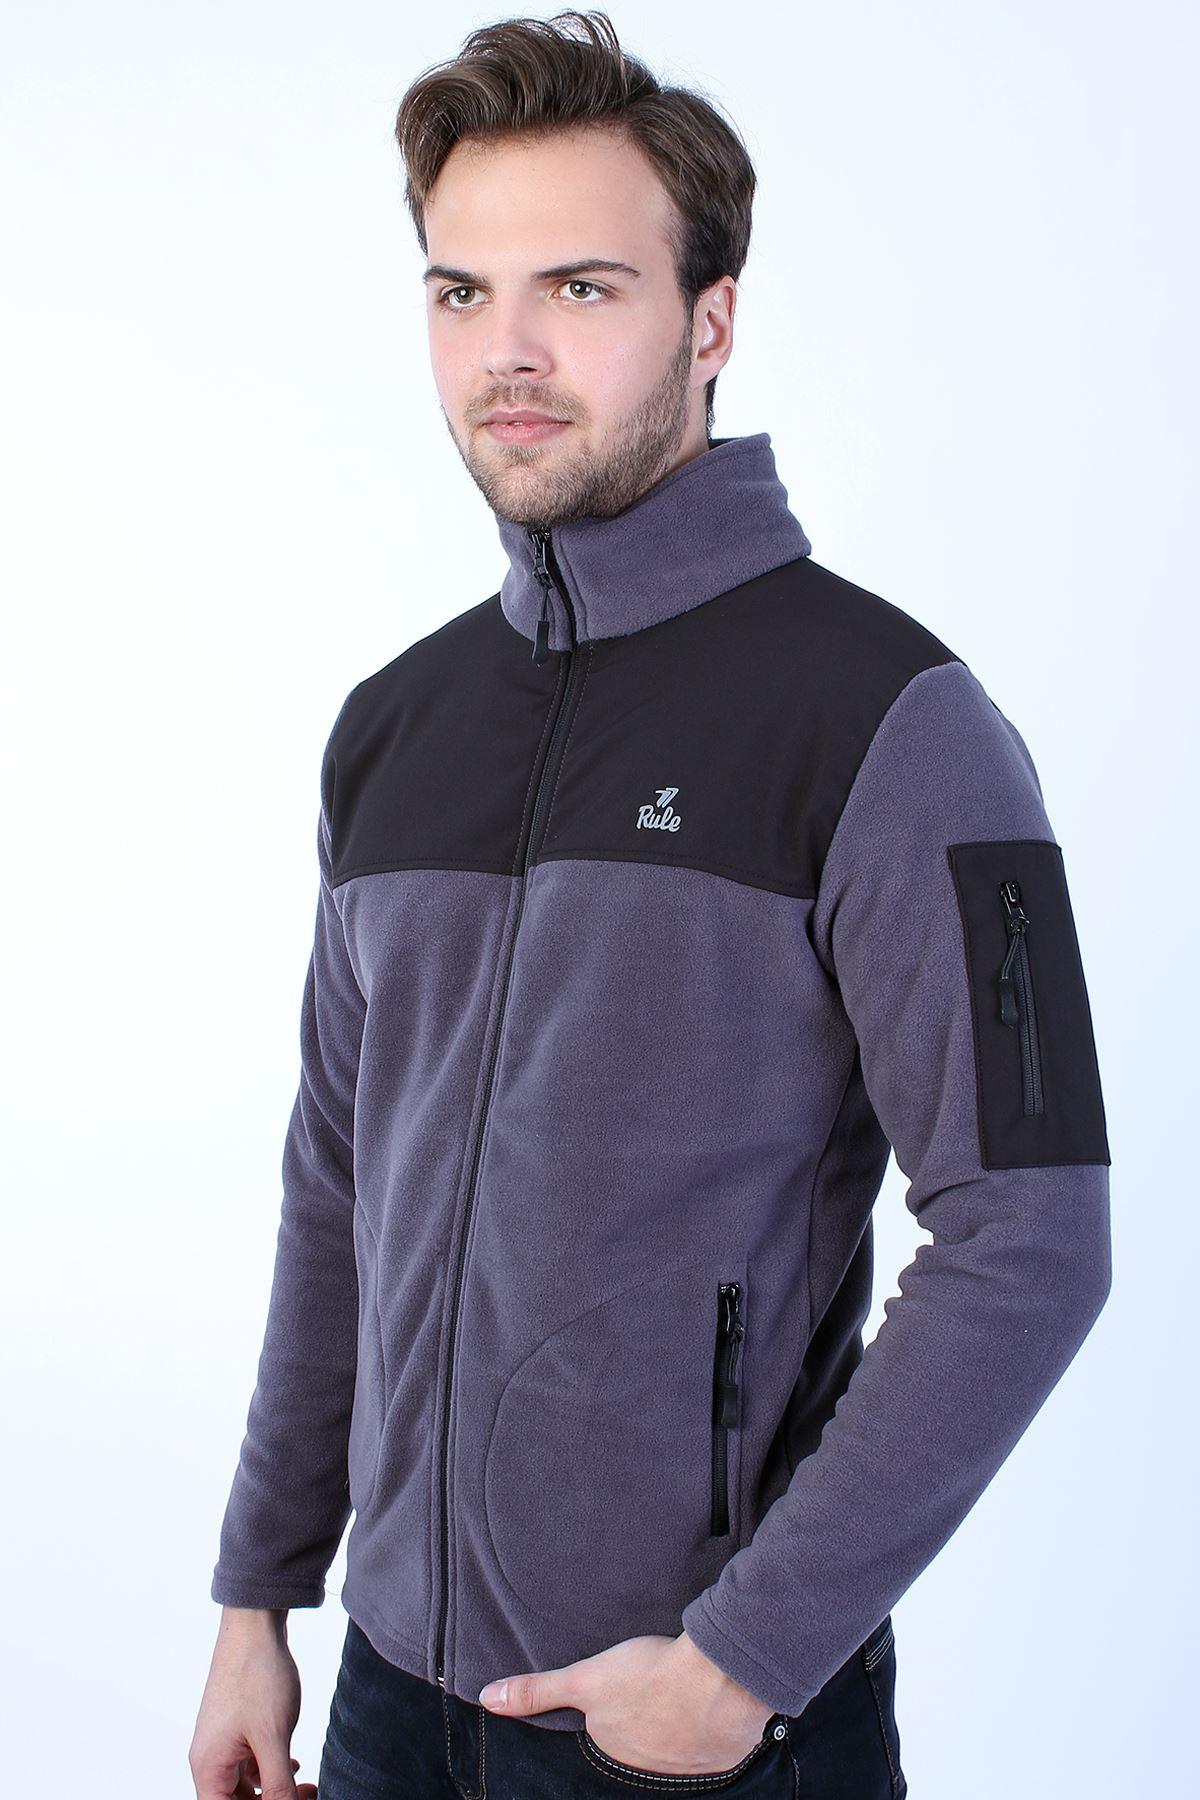 Erkek Antrasit Polar Dik Yaka Kol Cep Fermuar Detay Sweatshirt